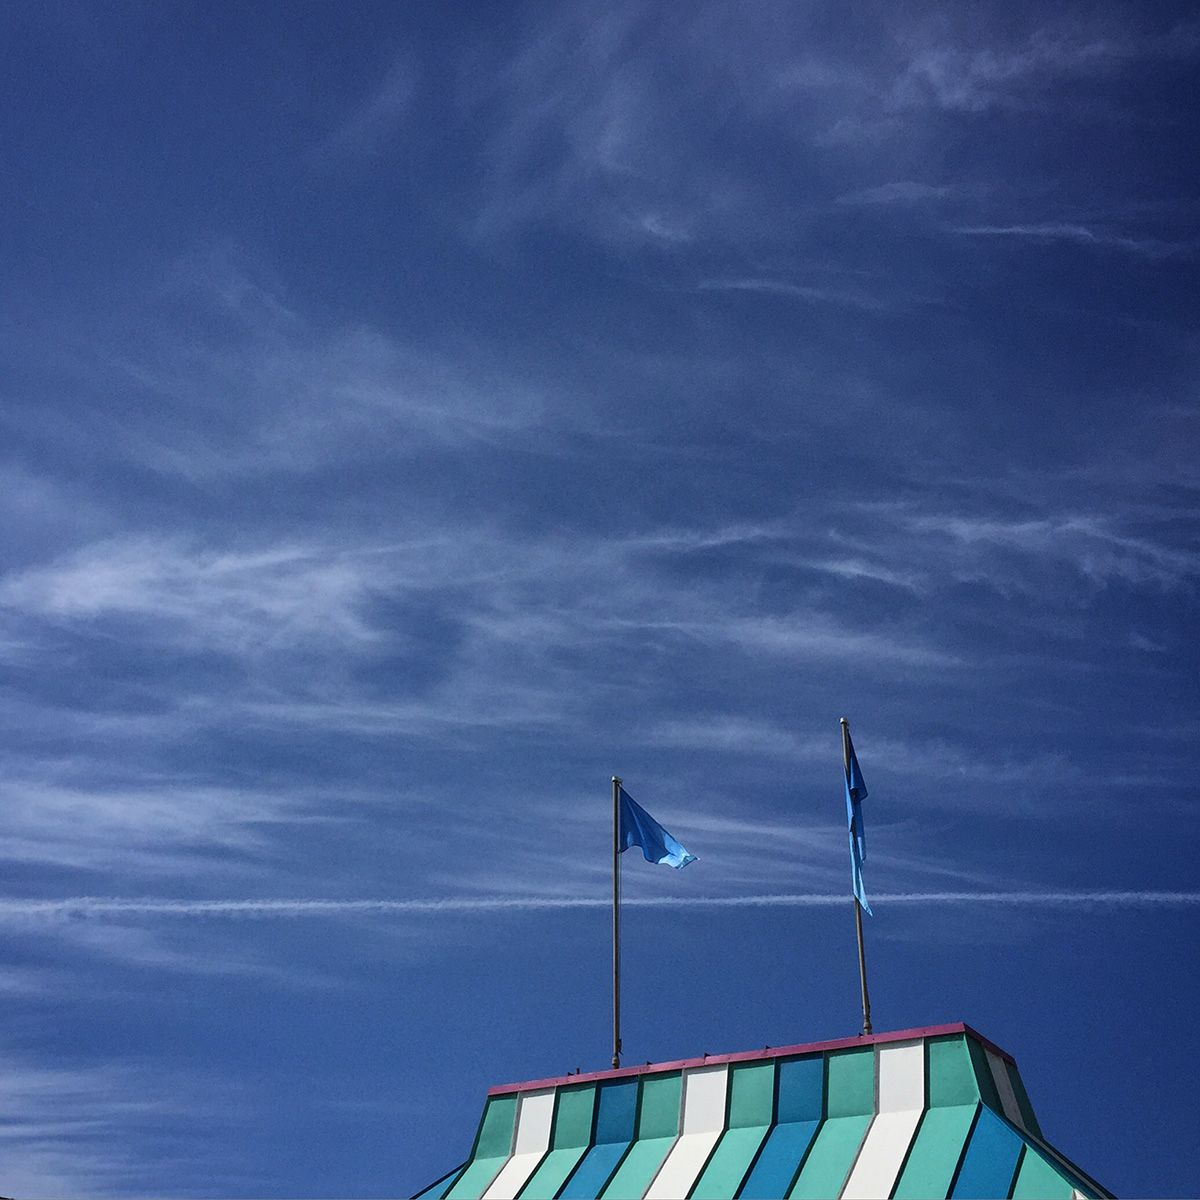 Shake It Up by @moseykim #mobilephotography #stripedroof #bluesky